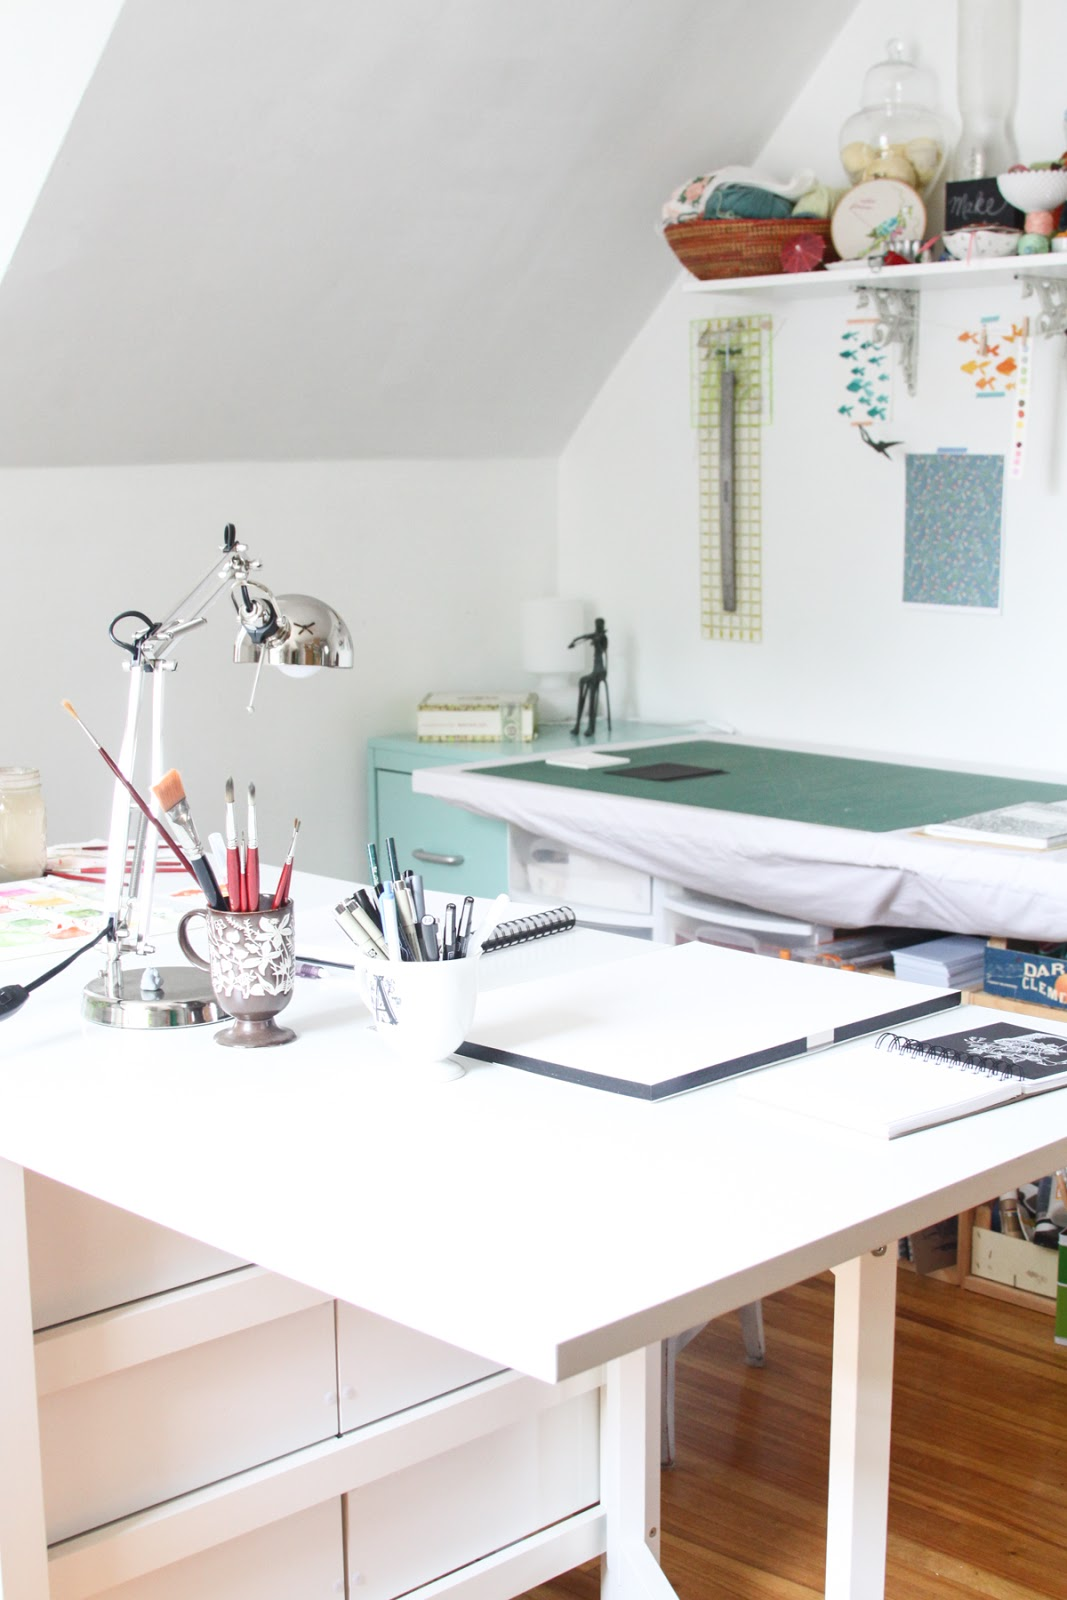 Studio, Artist Studio, Work Space, Work Tables, Studio Organization, Art  Supplies